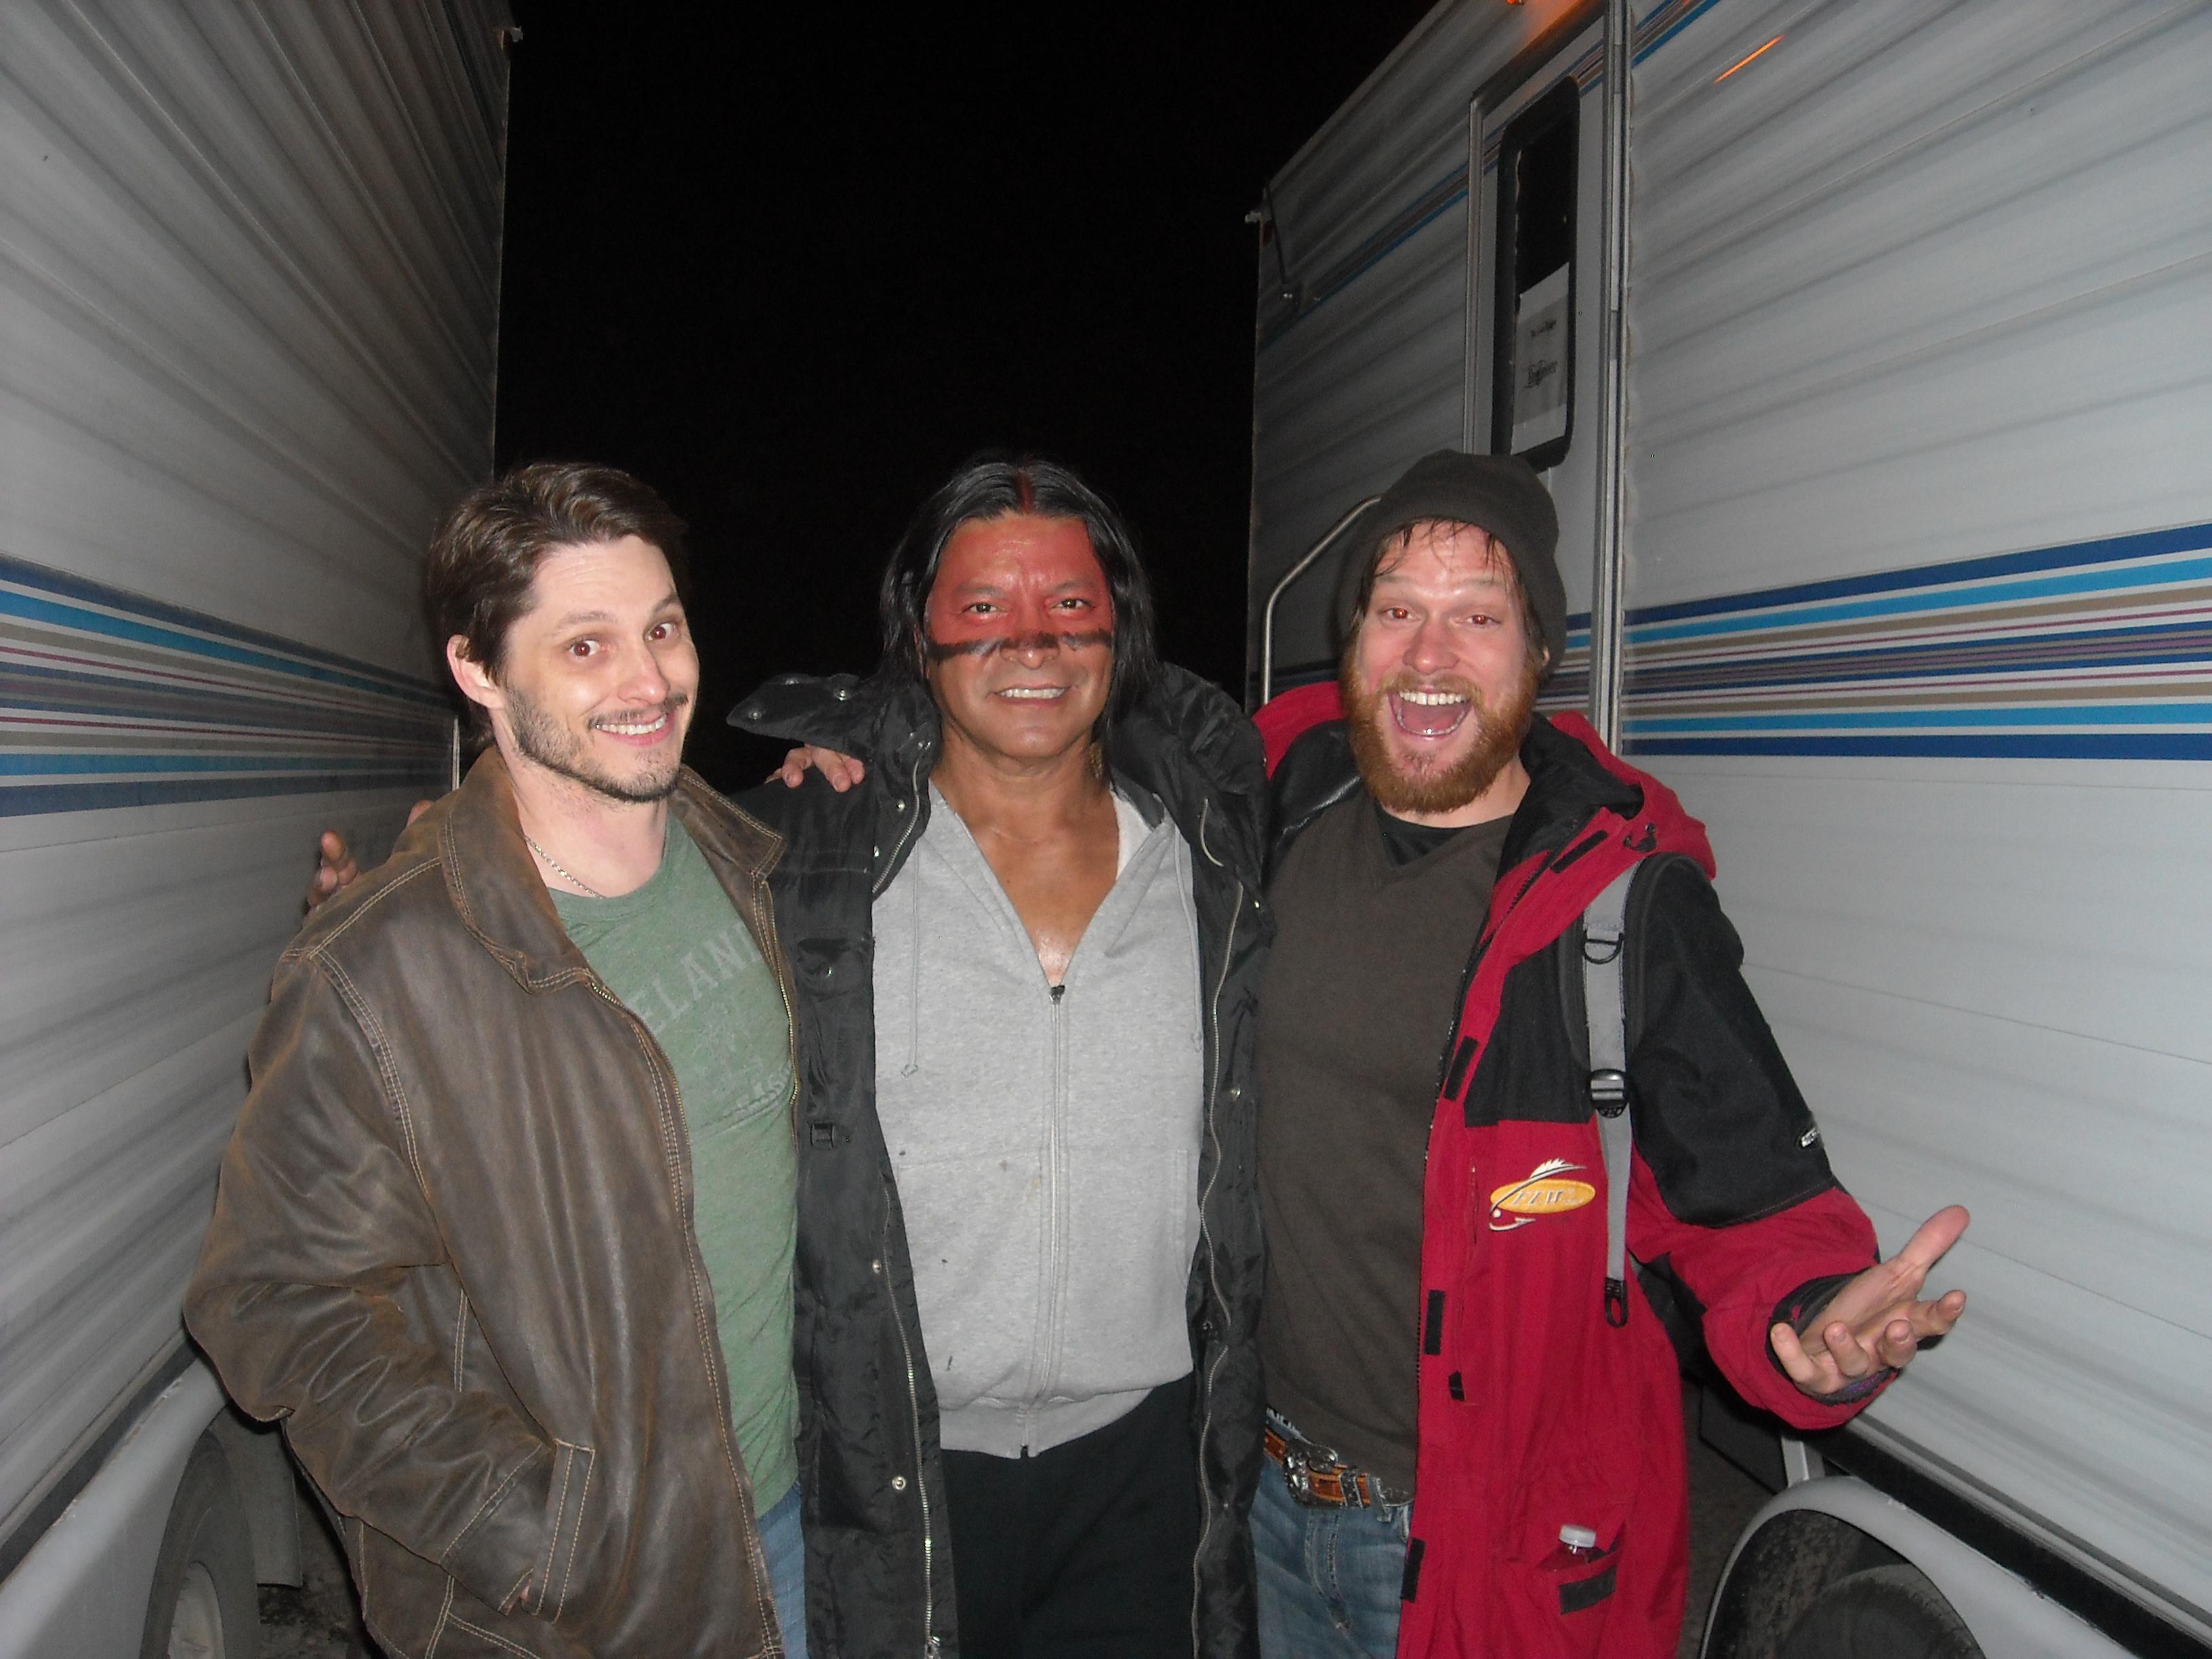 Stephen Brodie, Gil Birmingham, and Will Koberg on set of Disney's The Lone Ranger